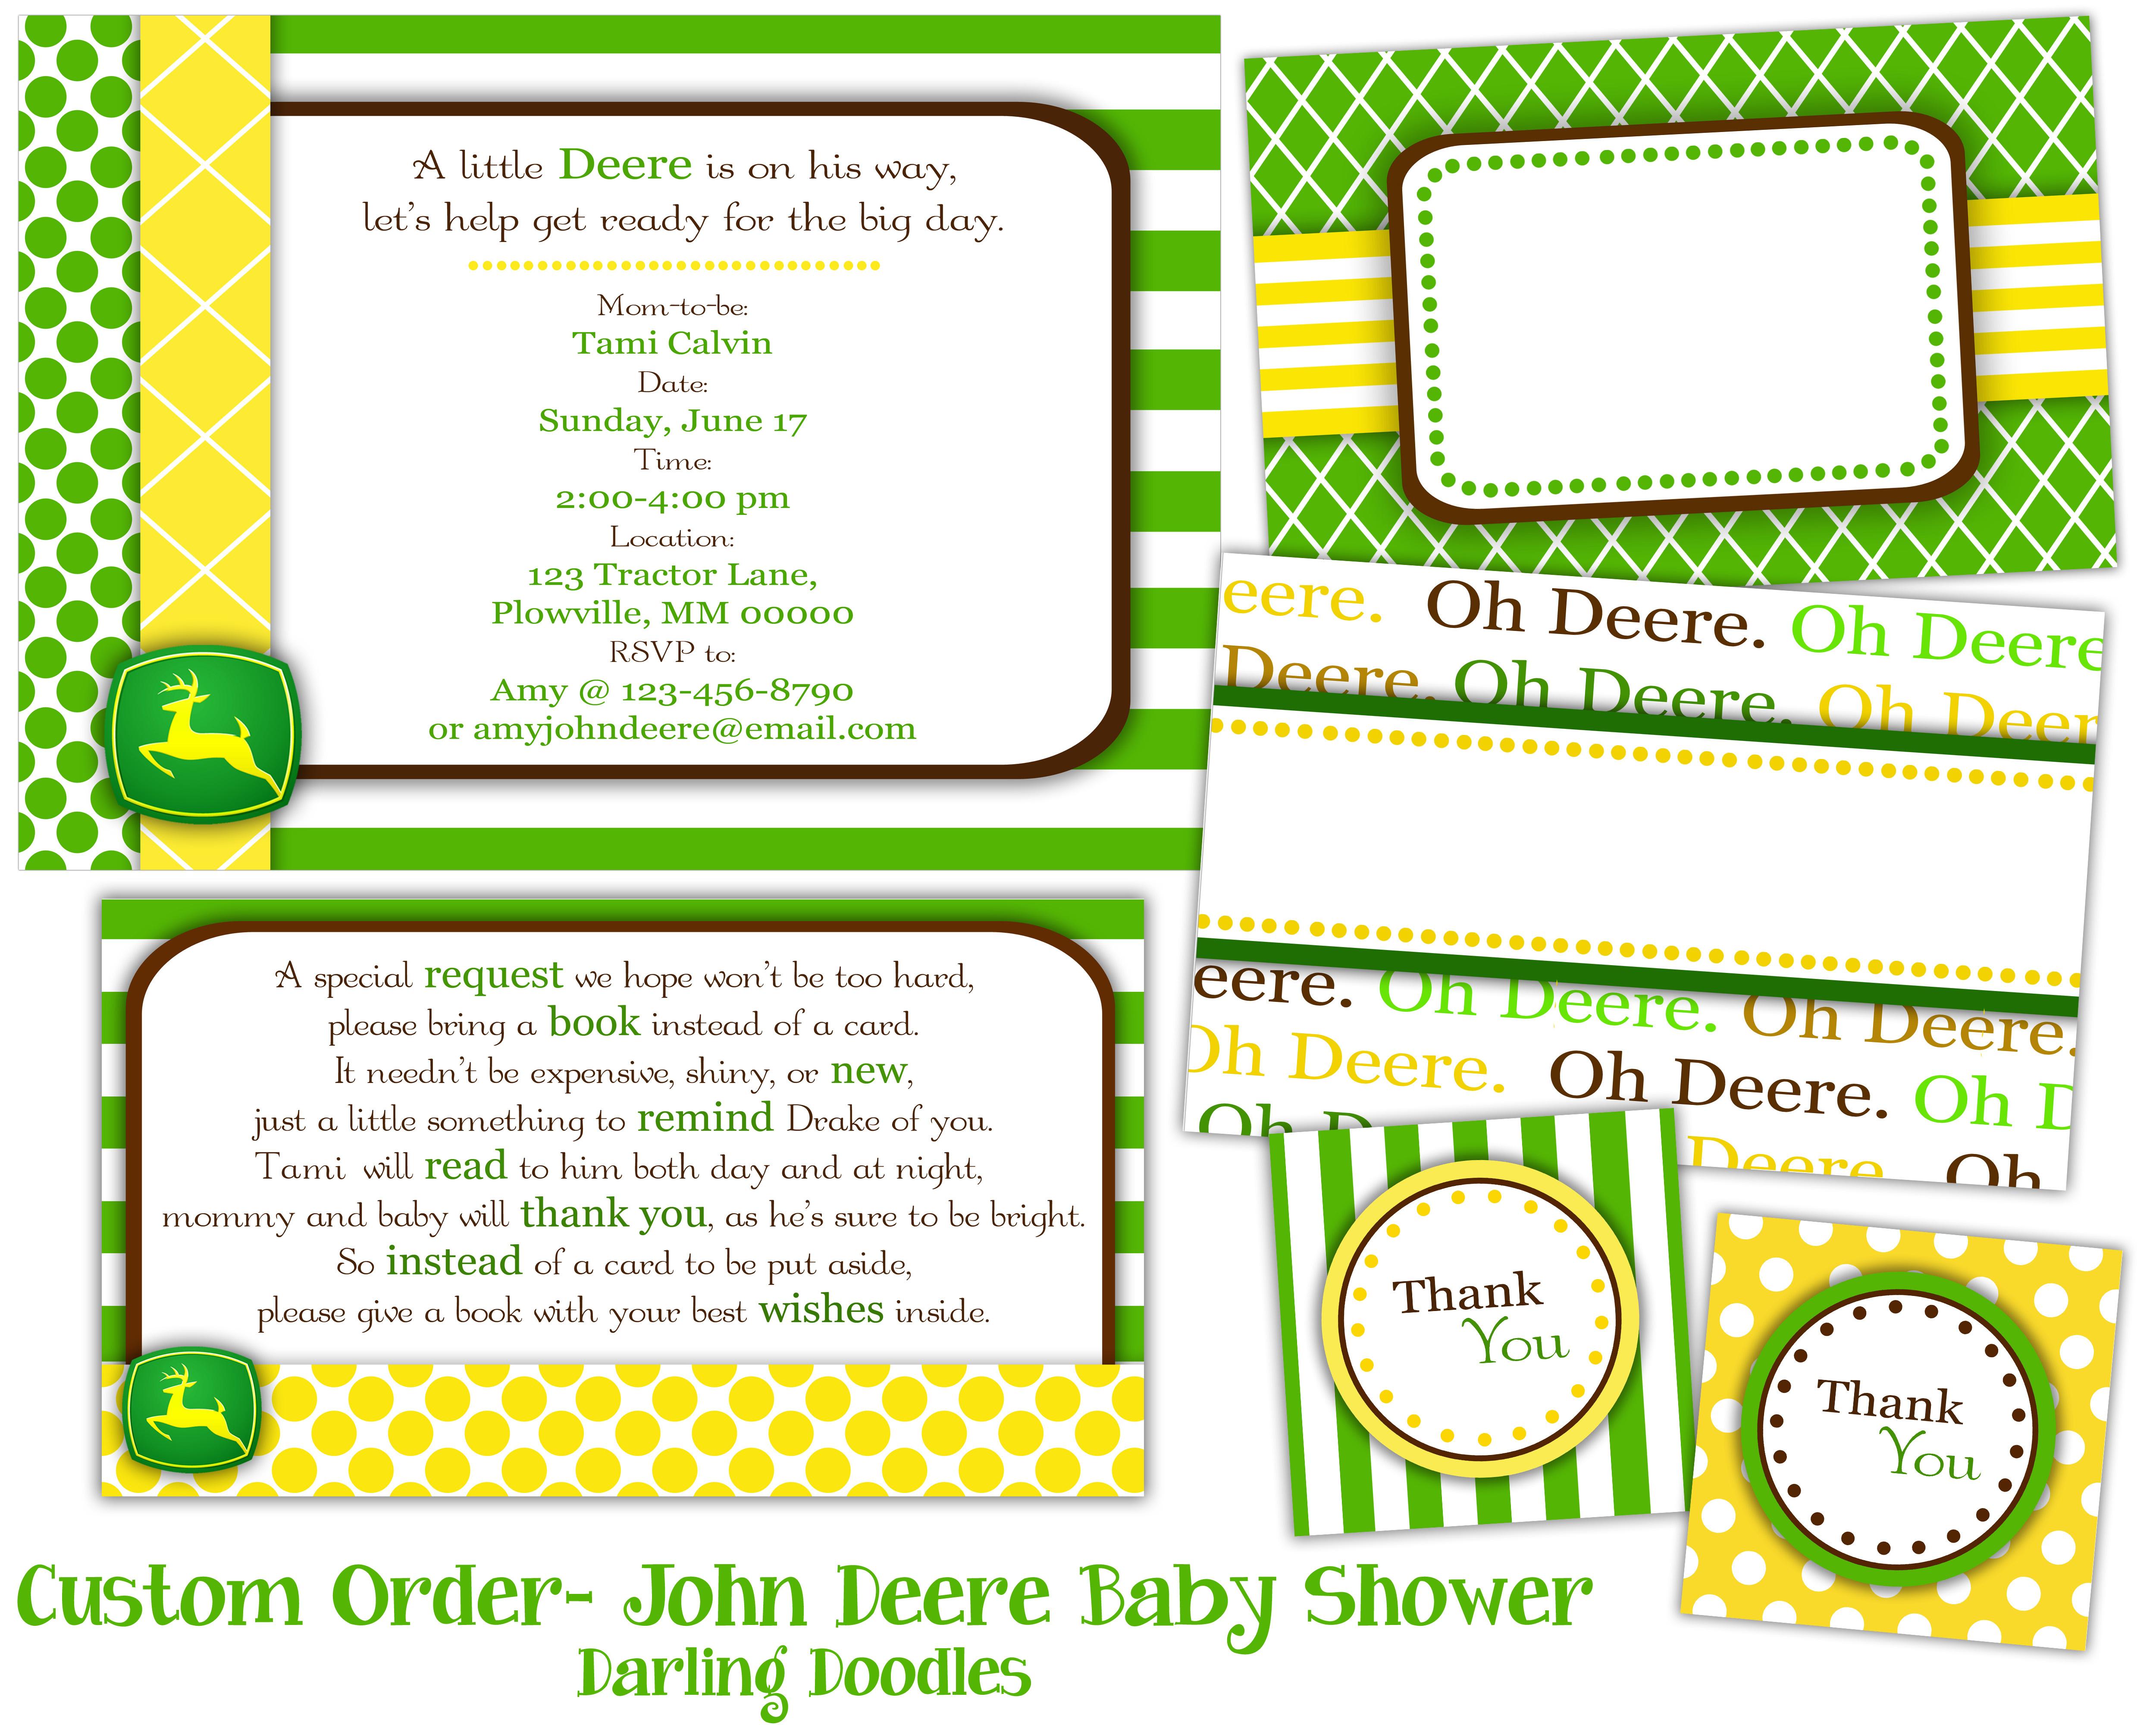 John Deere Baby Shower Invitations For Free   Shilohmidwifery - Free Printable John Deere Baby Shower Invitations